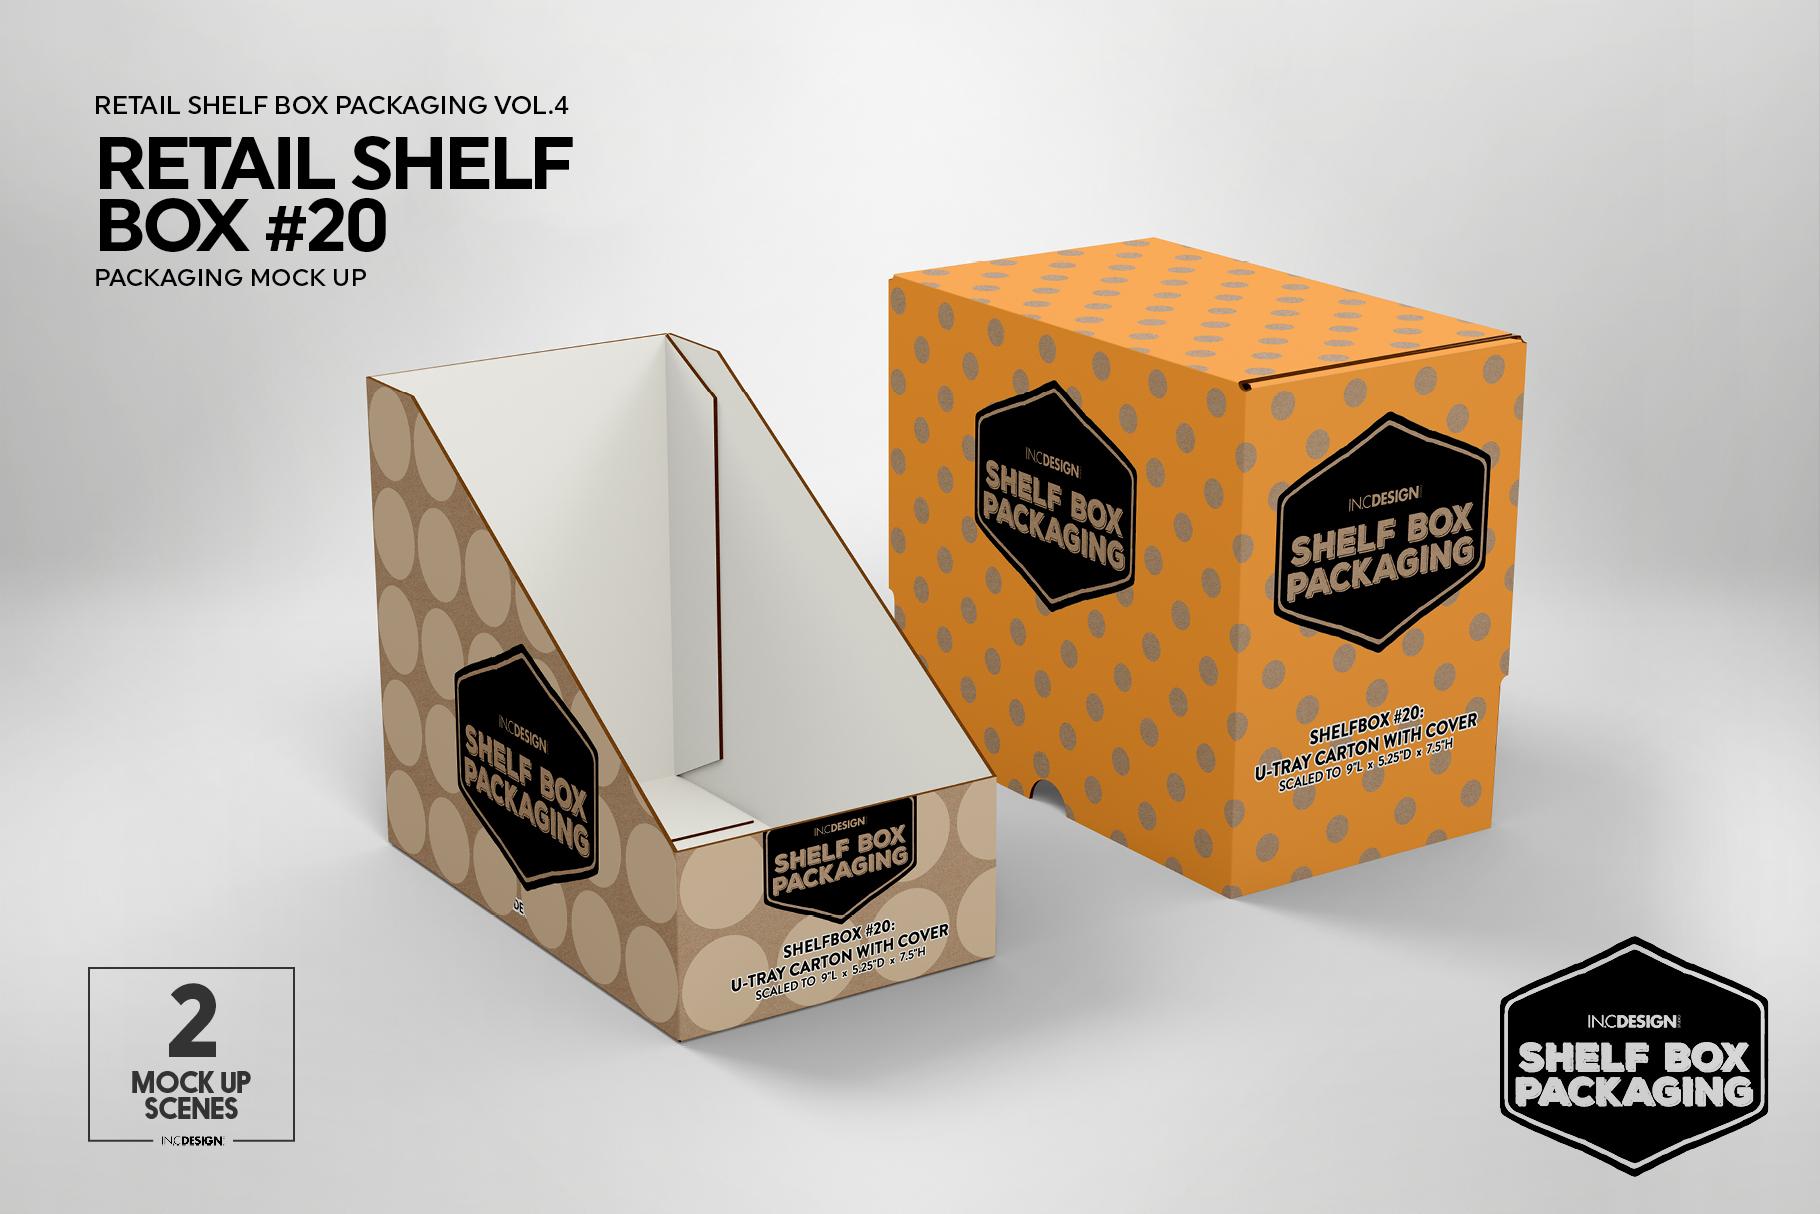 Retail Shelf Box 20 Packaging Mockup example image 8